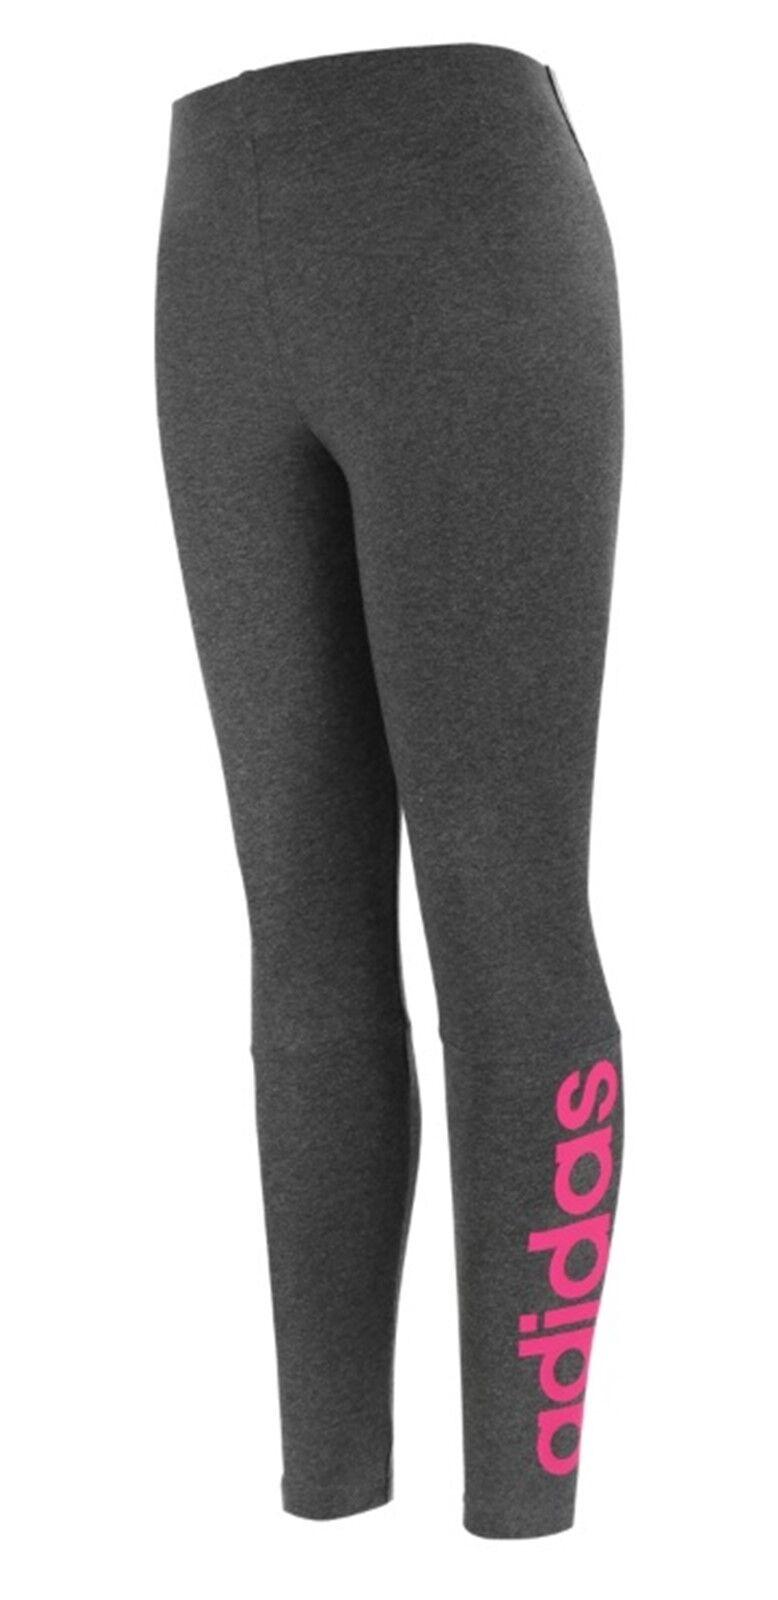 Adidas Women Essentials Linear Enge Hose Graues Training Yoga GYM Jersey CZ5740